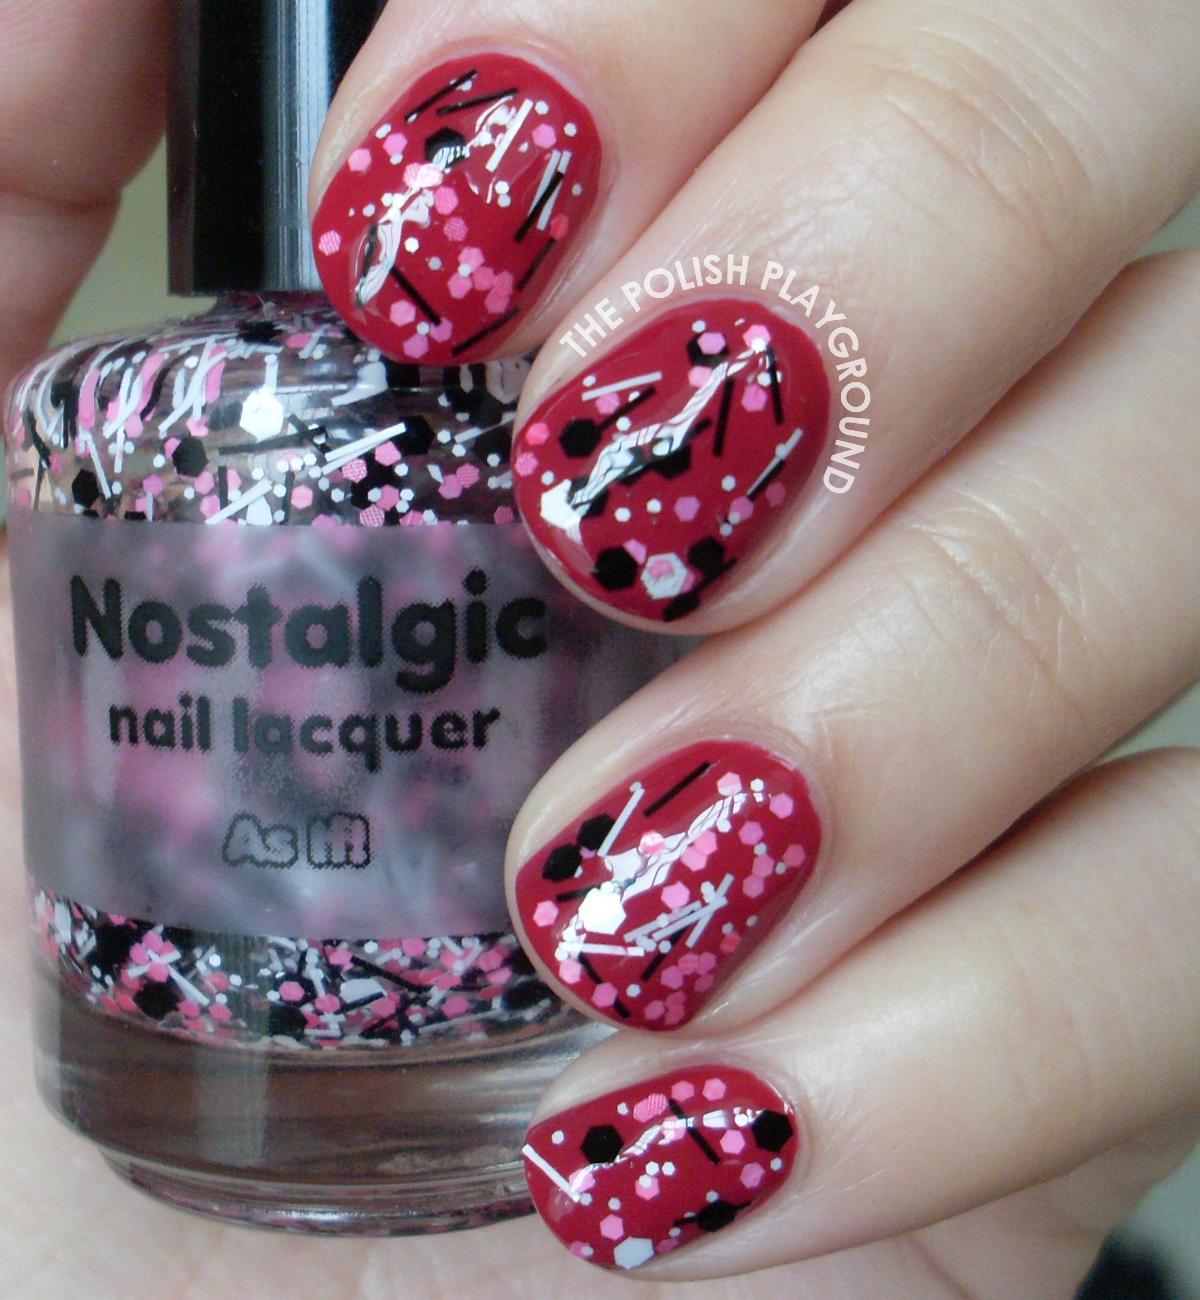 Nostalgic Nail Lacquer As If!